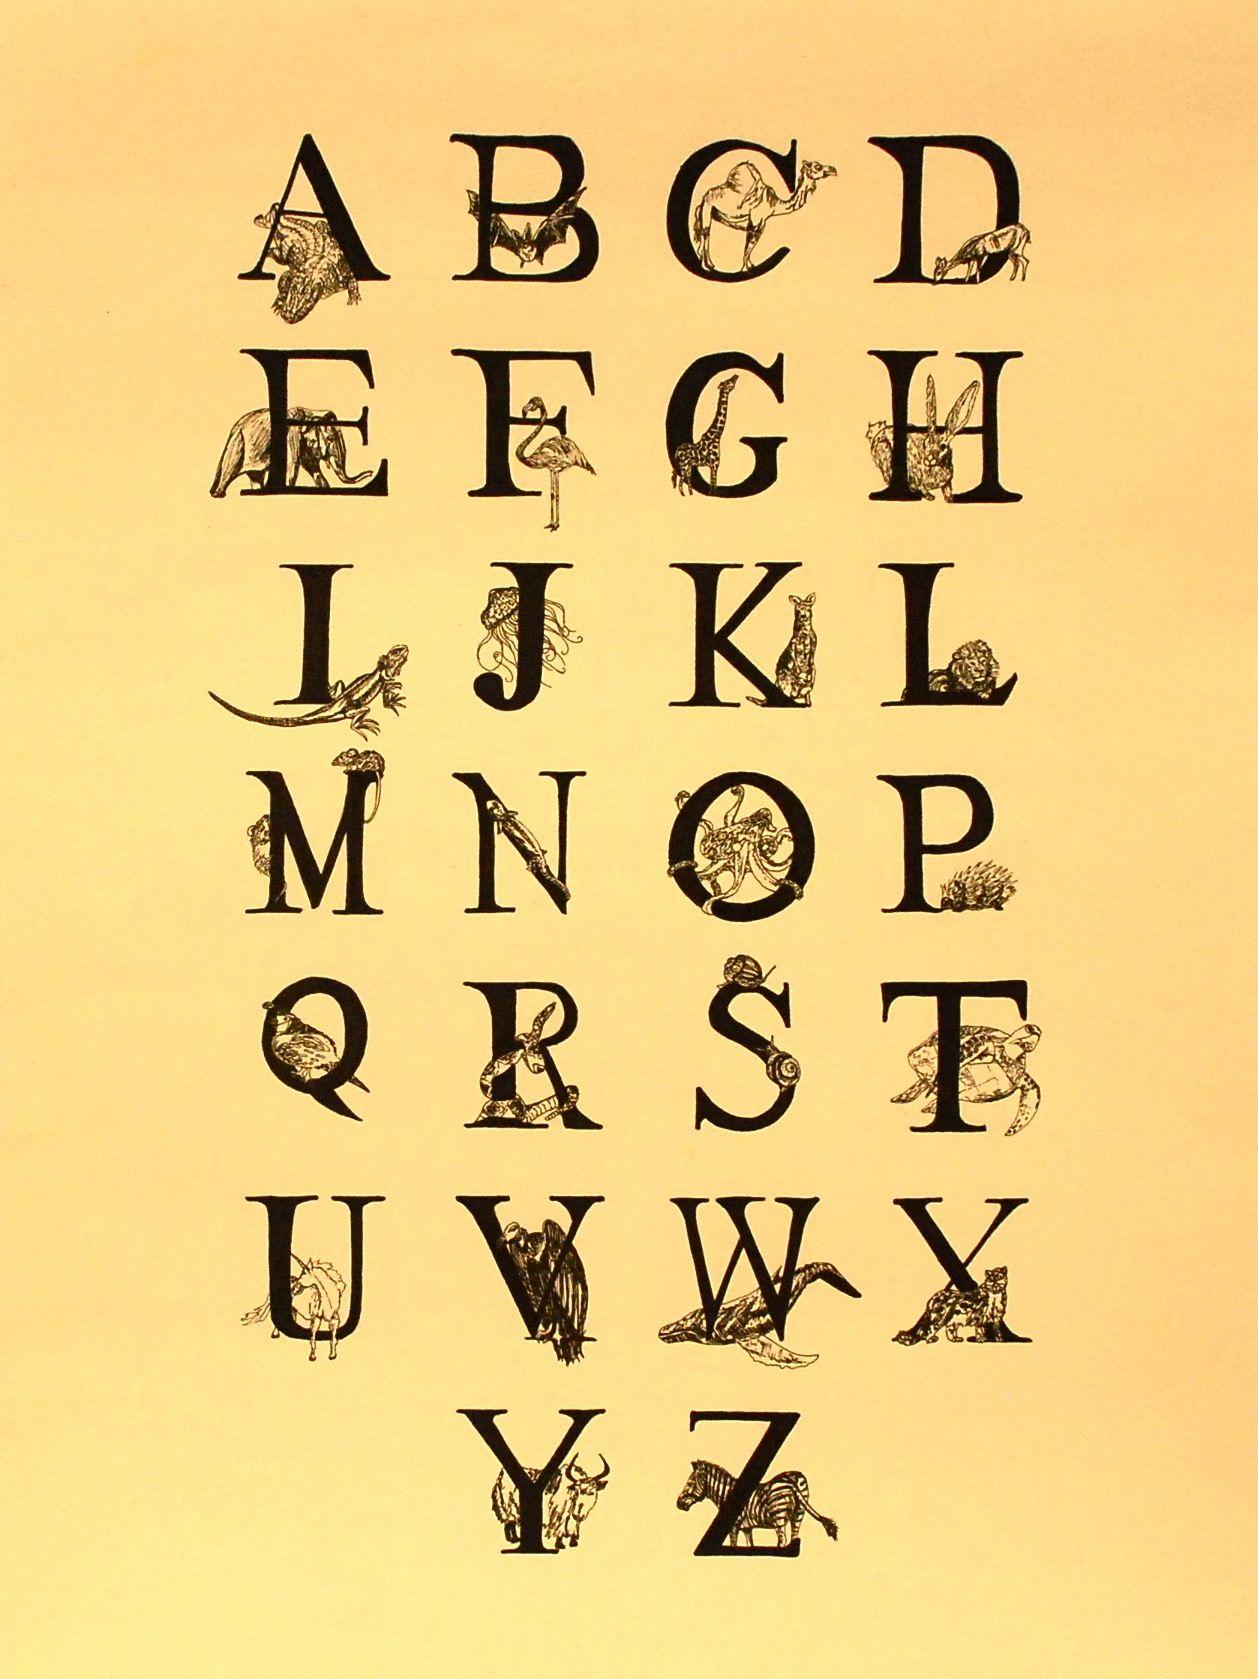 Alphabet Animals Illustration by Rosemary Santarelli